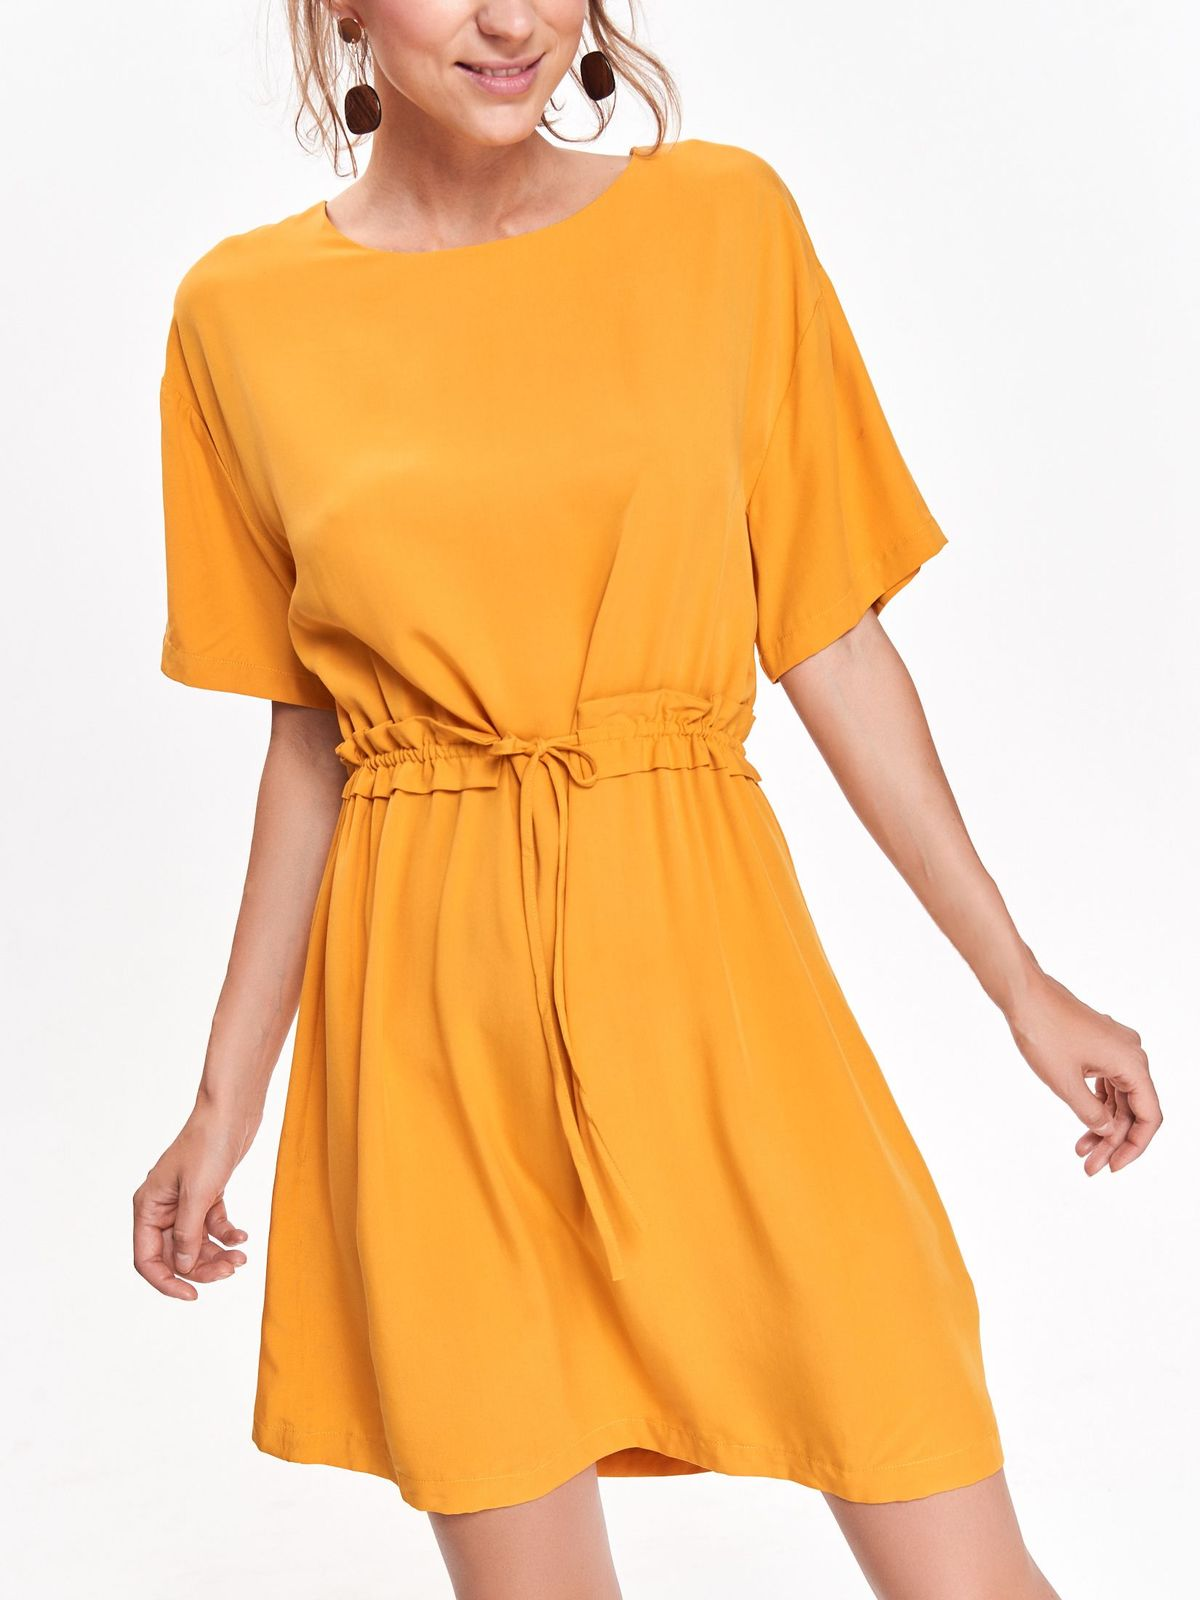 TOP SECRET TOP SECRET μινι φορεμα soft denim